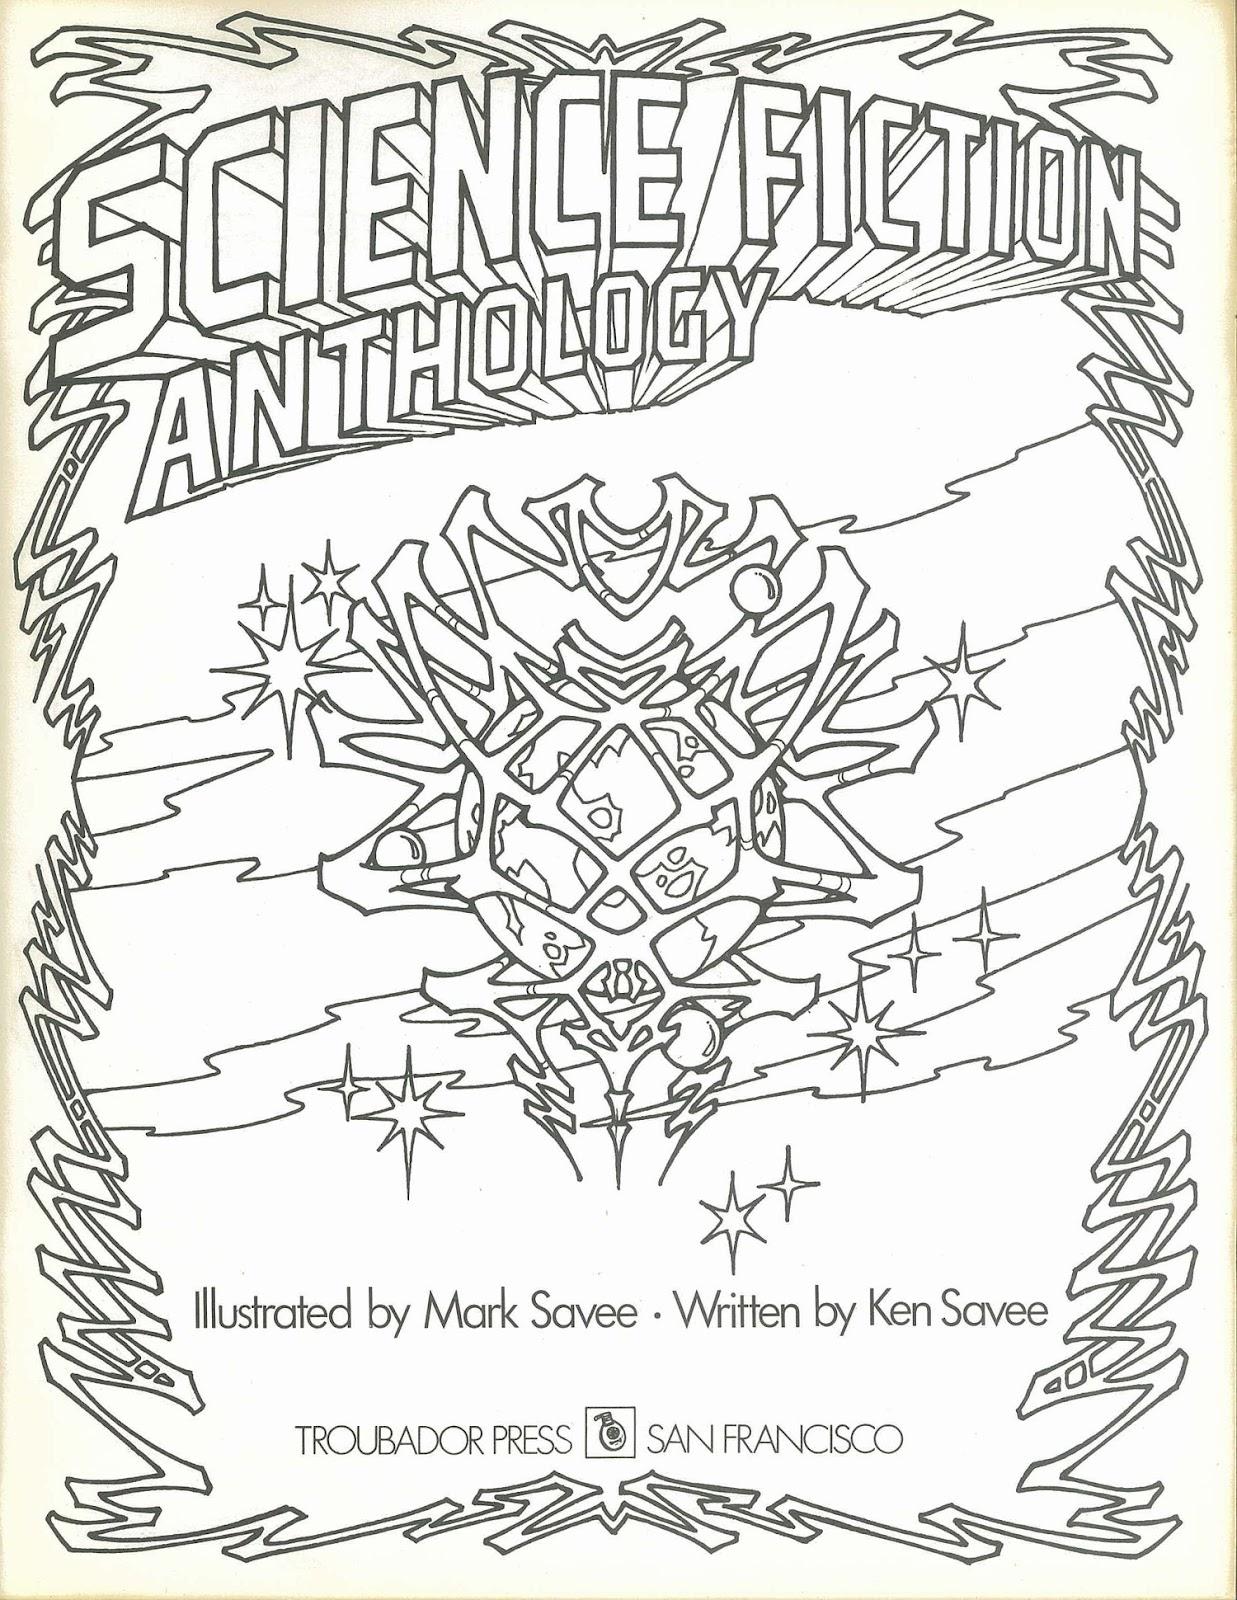 Troubador Press: Science Fiction Anthology (1974) and